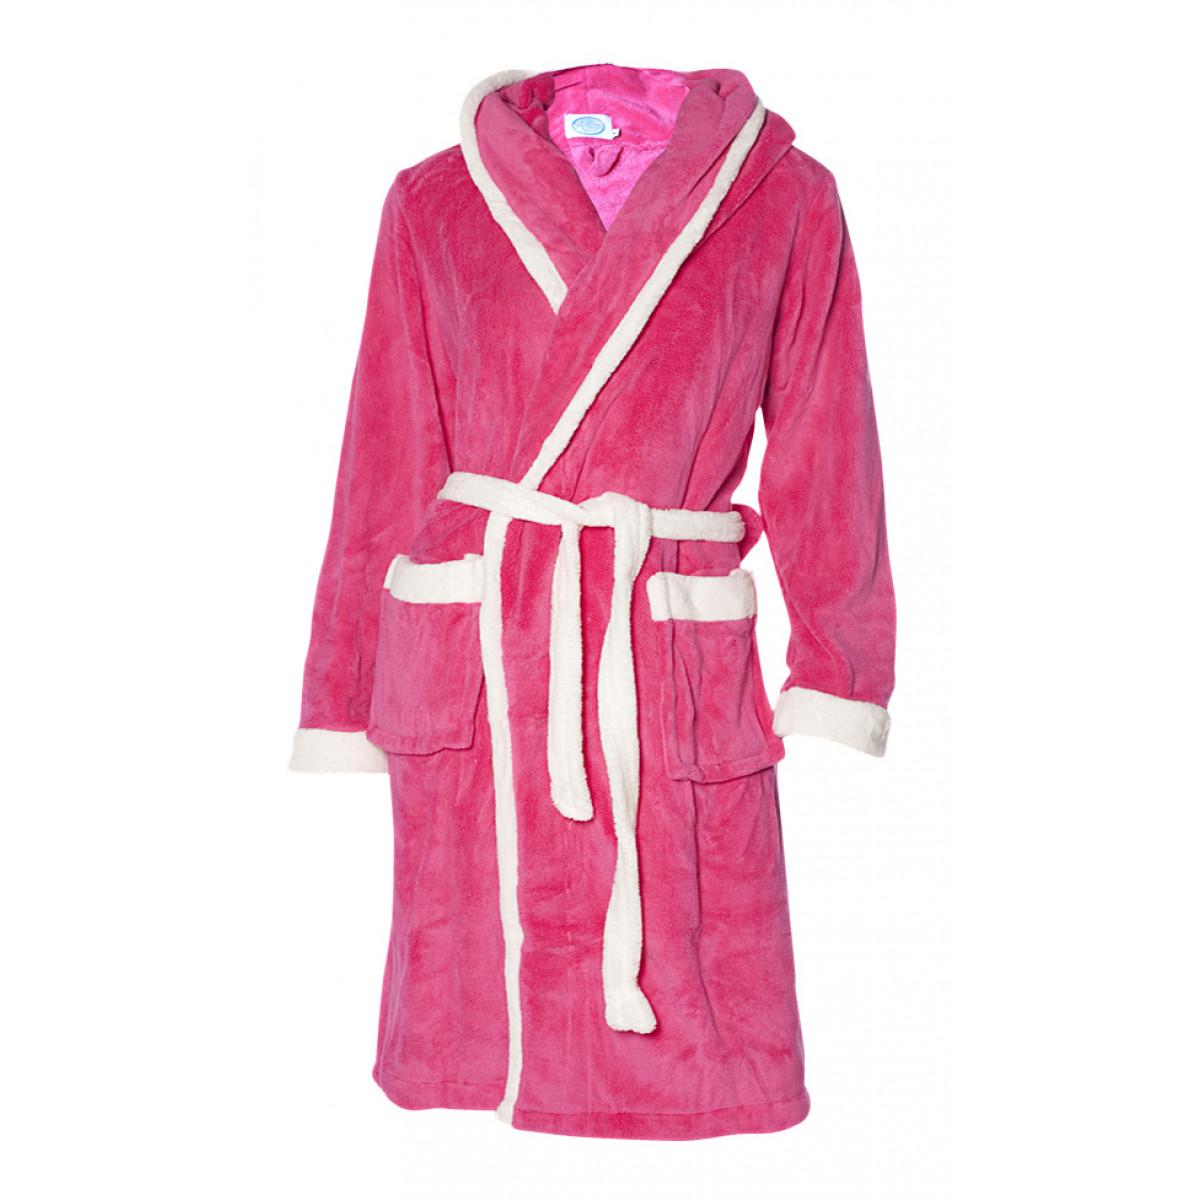 Roze kinderbadjas